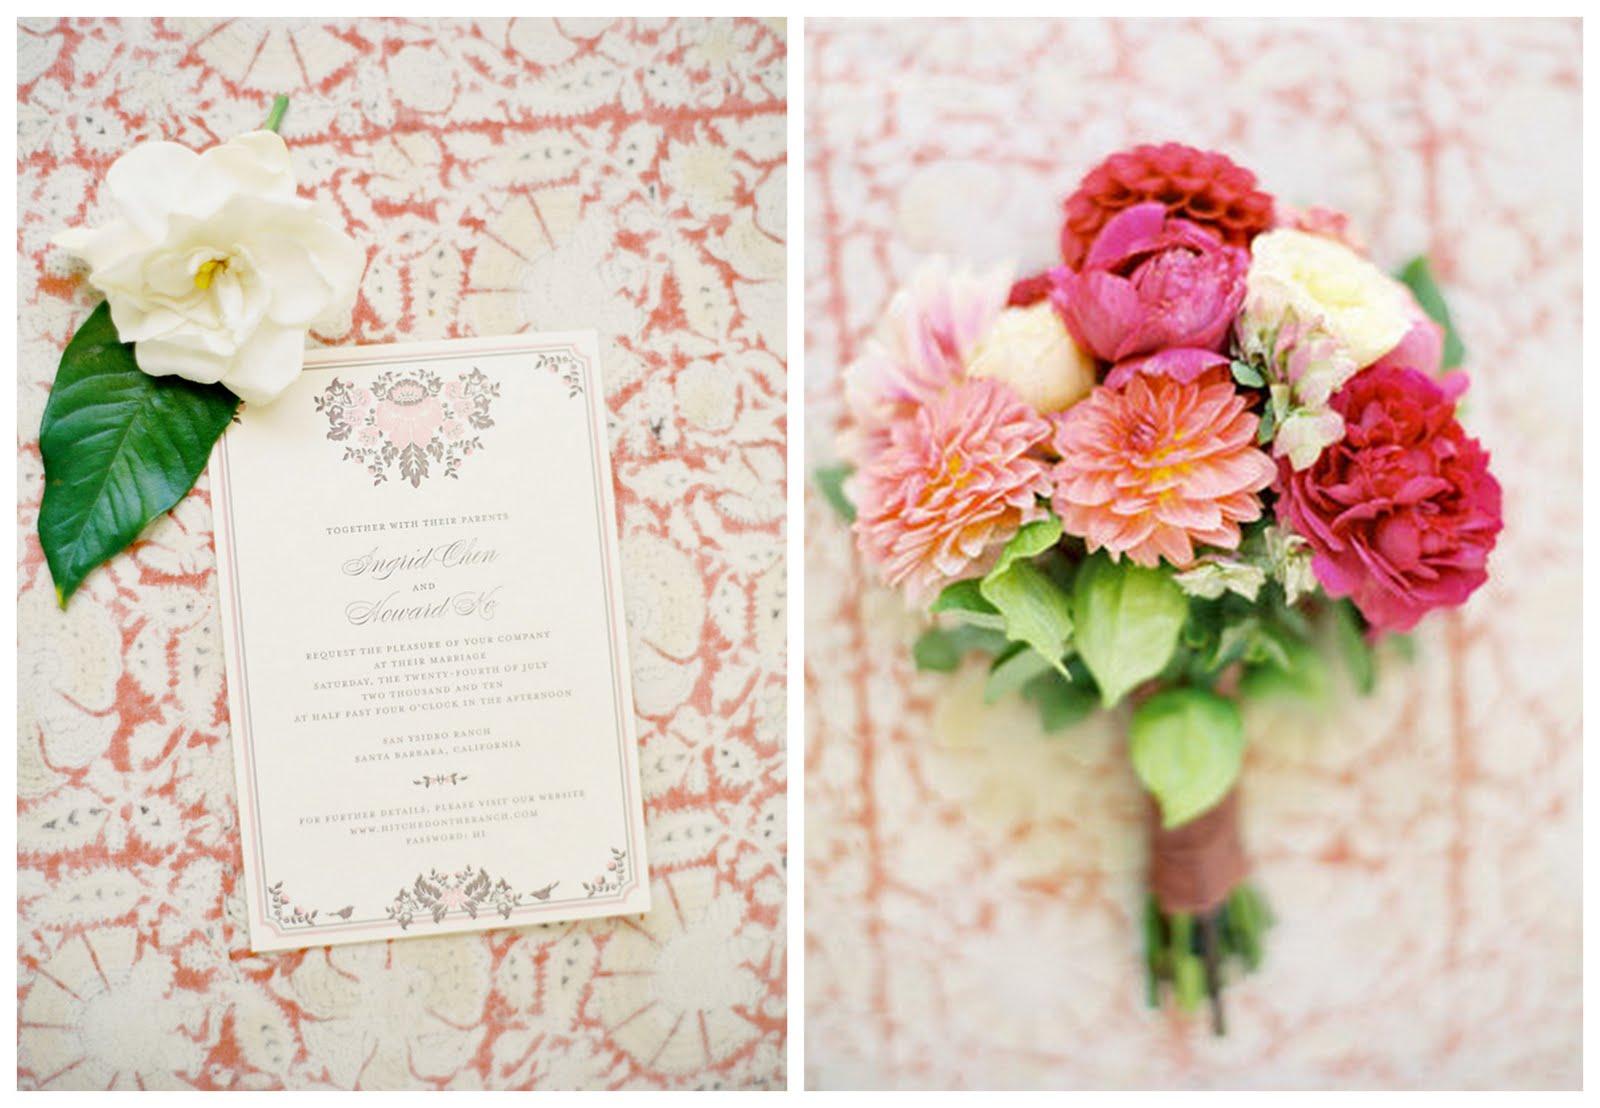 Wedding Flowers By Season 18 New They e into season